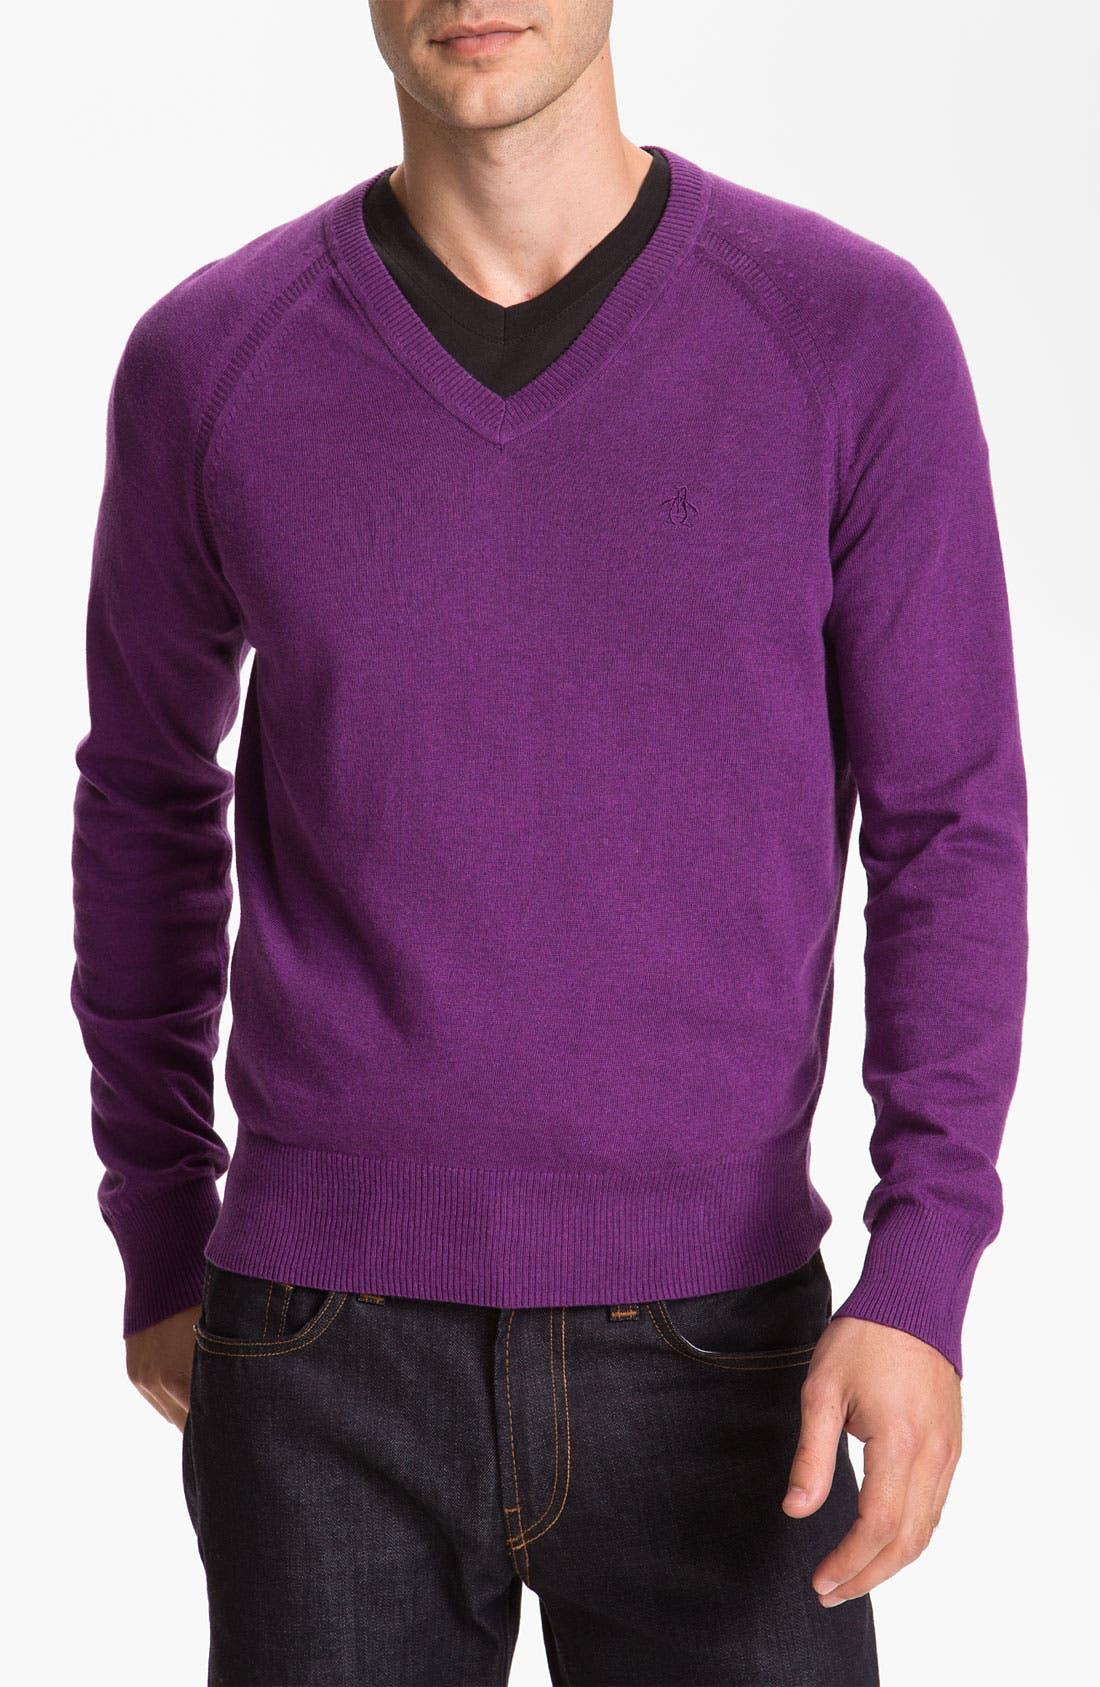 Alternate Image 1 Selected - Original Penguin Pima Cotton V-Neck Sweater